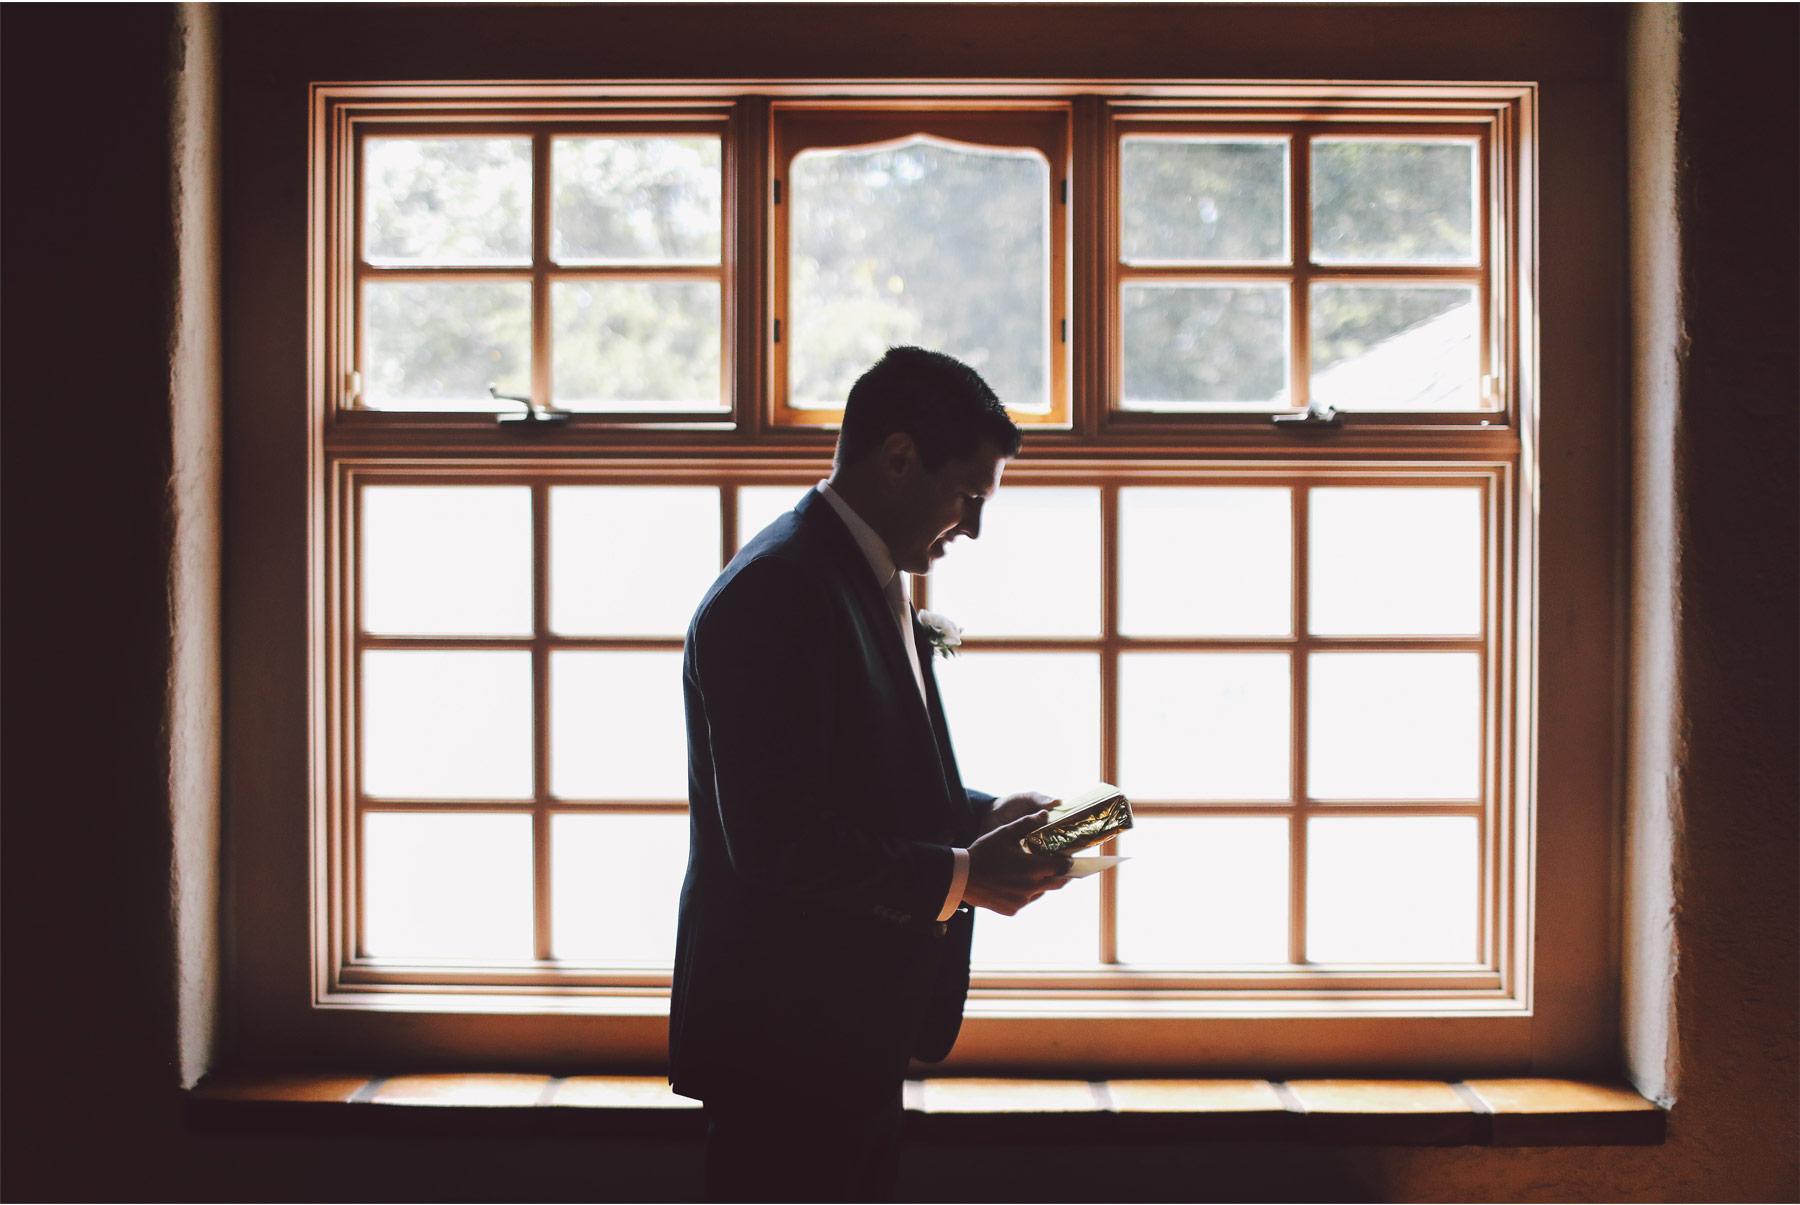 03-Weding-by-Vick-Photography-Minneapolis-Minnesota-Bavaria-Downs-Groom-Window-Rebecca-and-Mark.jpg